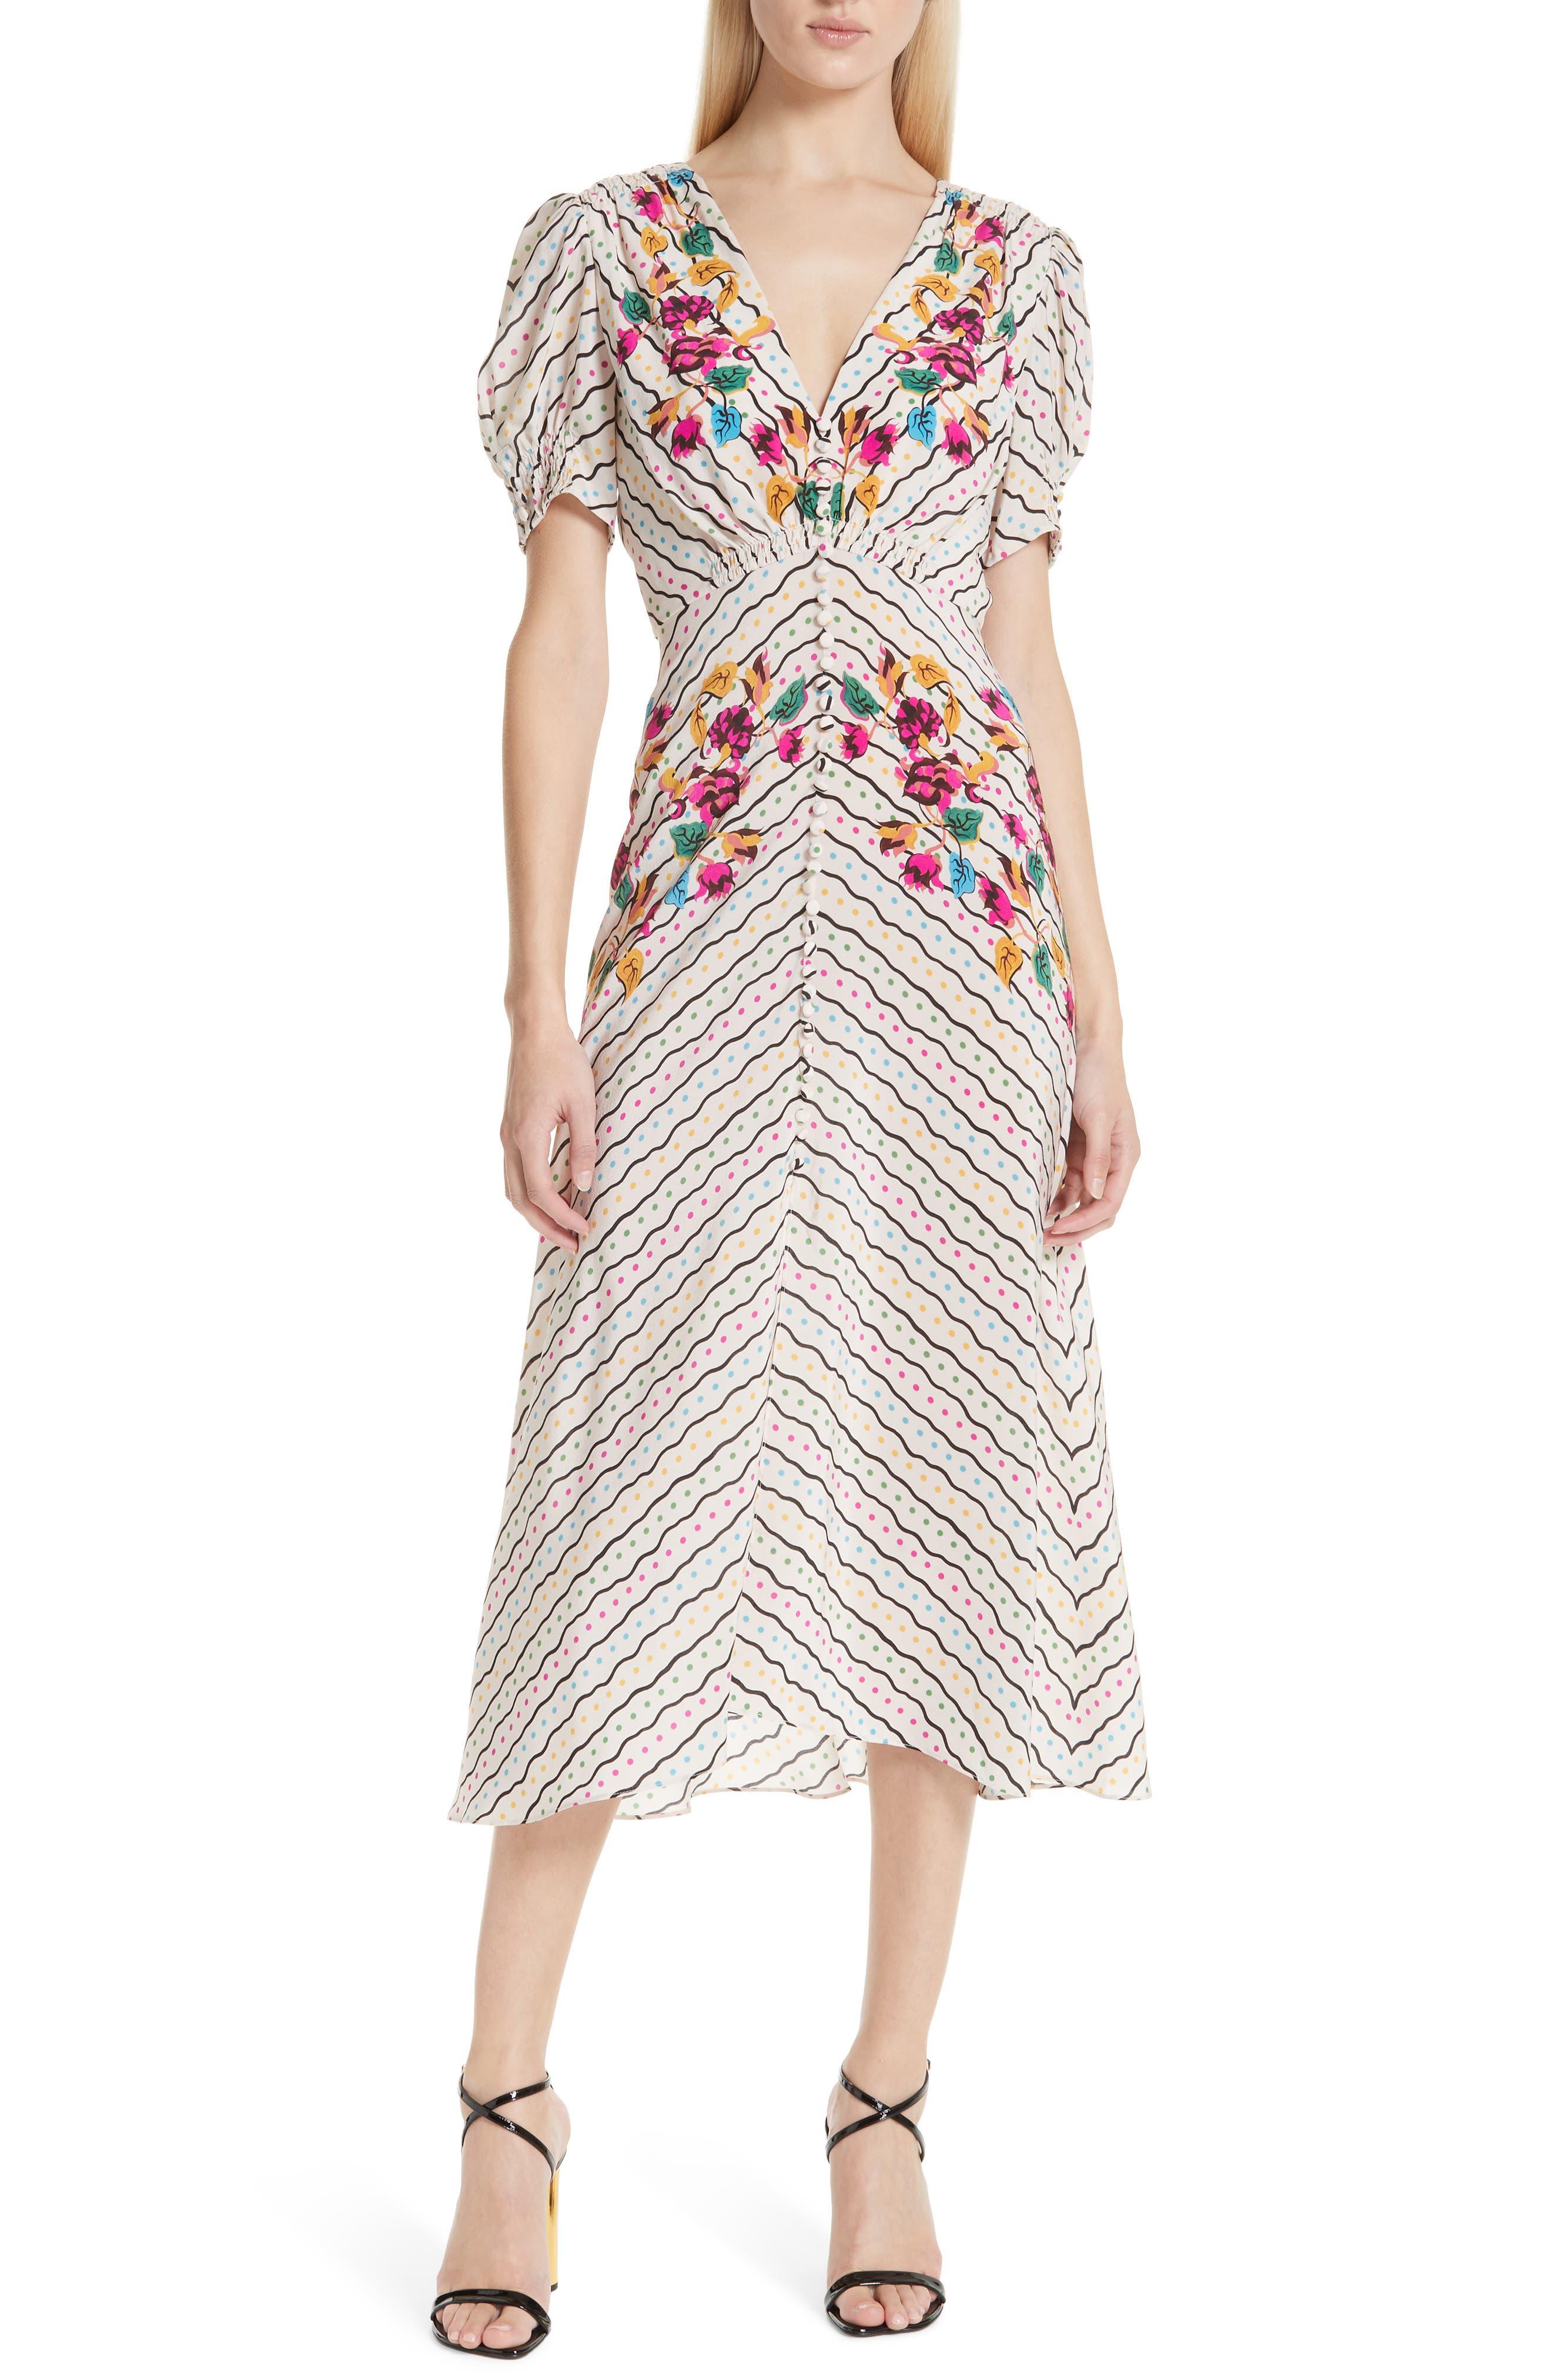 SALONI, Lea Silk Midi Dress, Main thumbnail 1, color, JAPONICA WIGGLE PLACEMENT